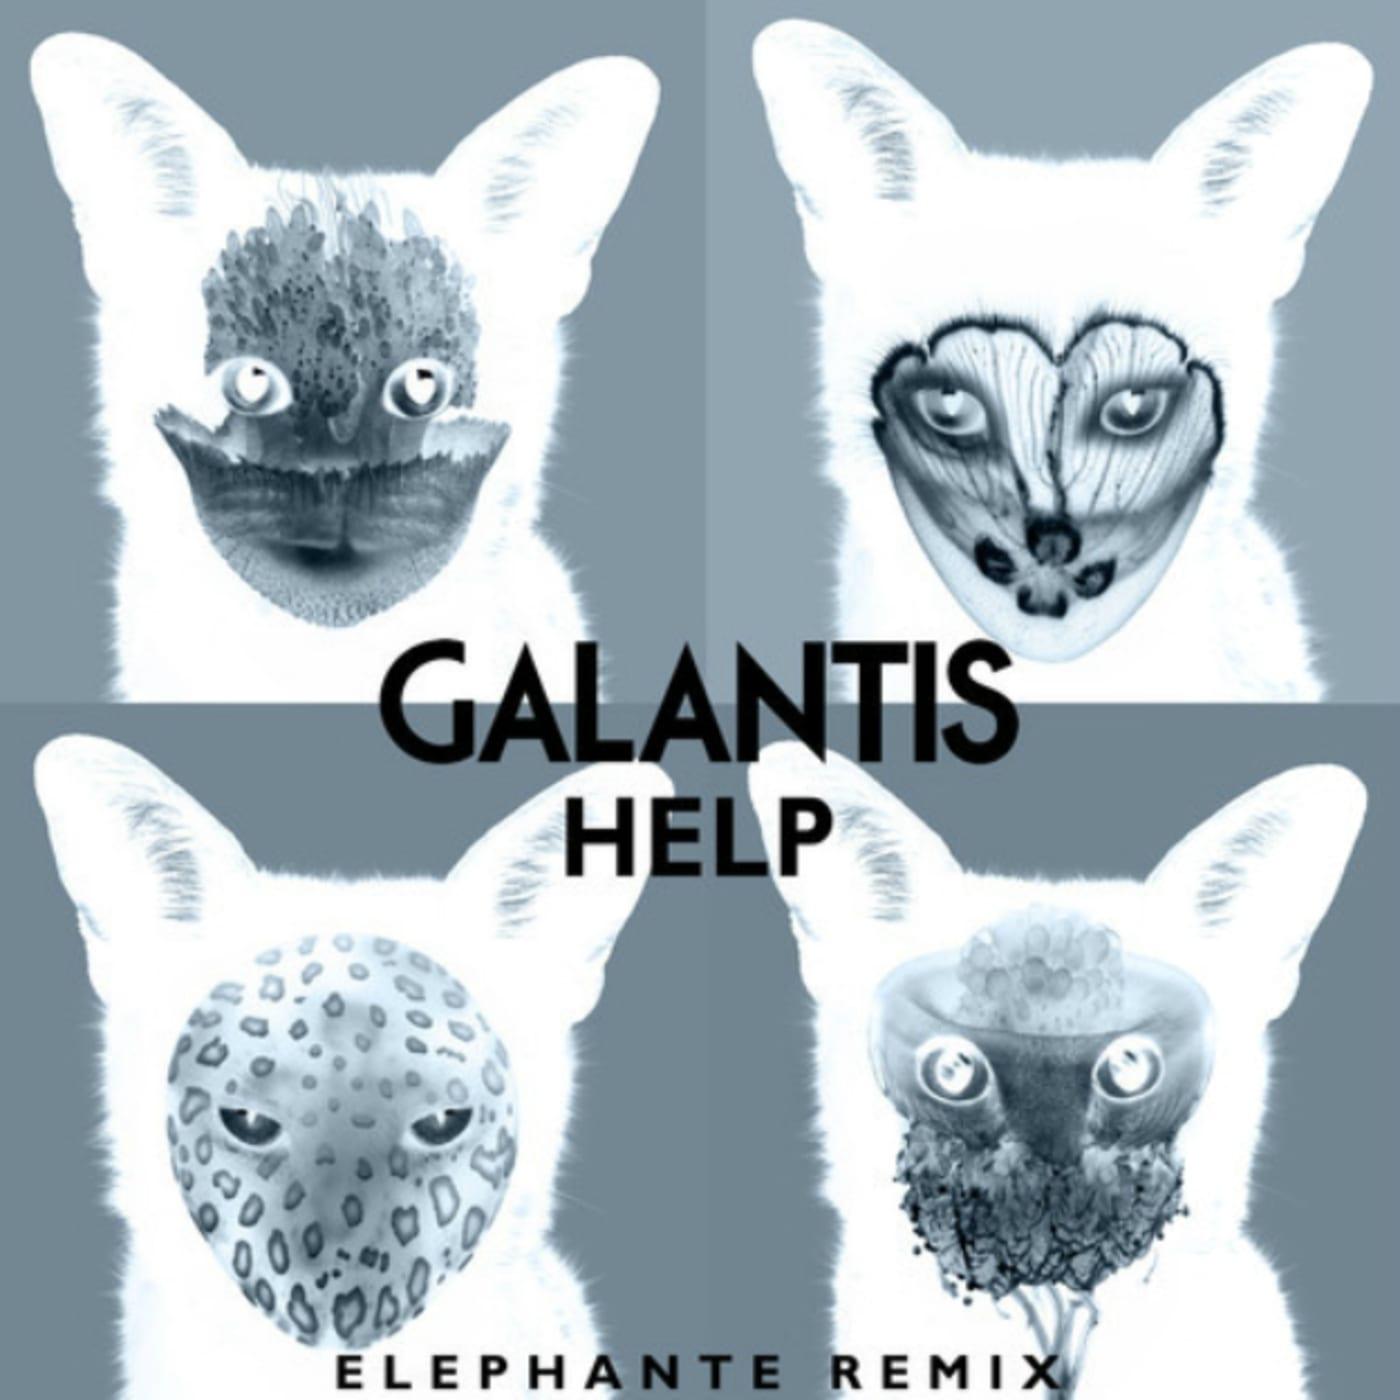 galantis help elephante remix